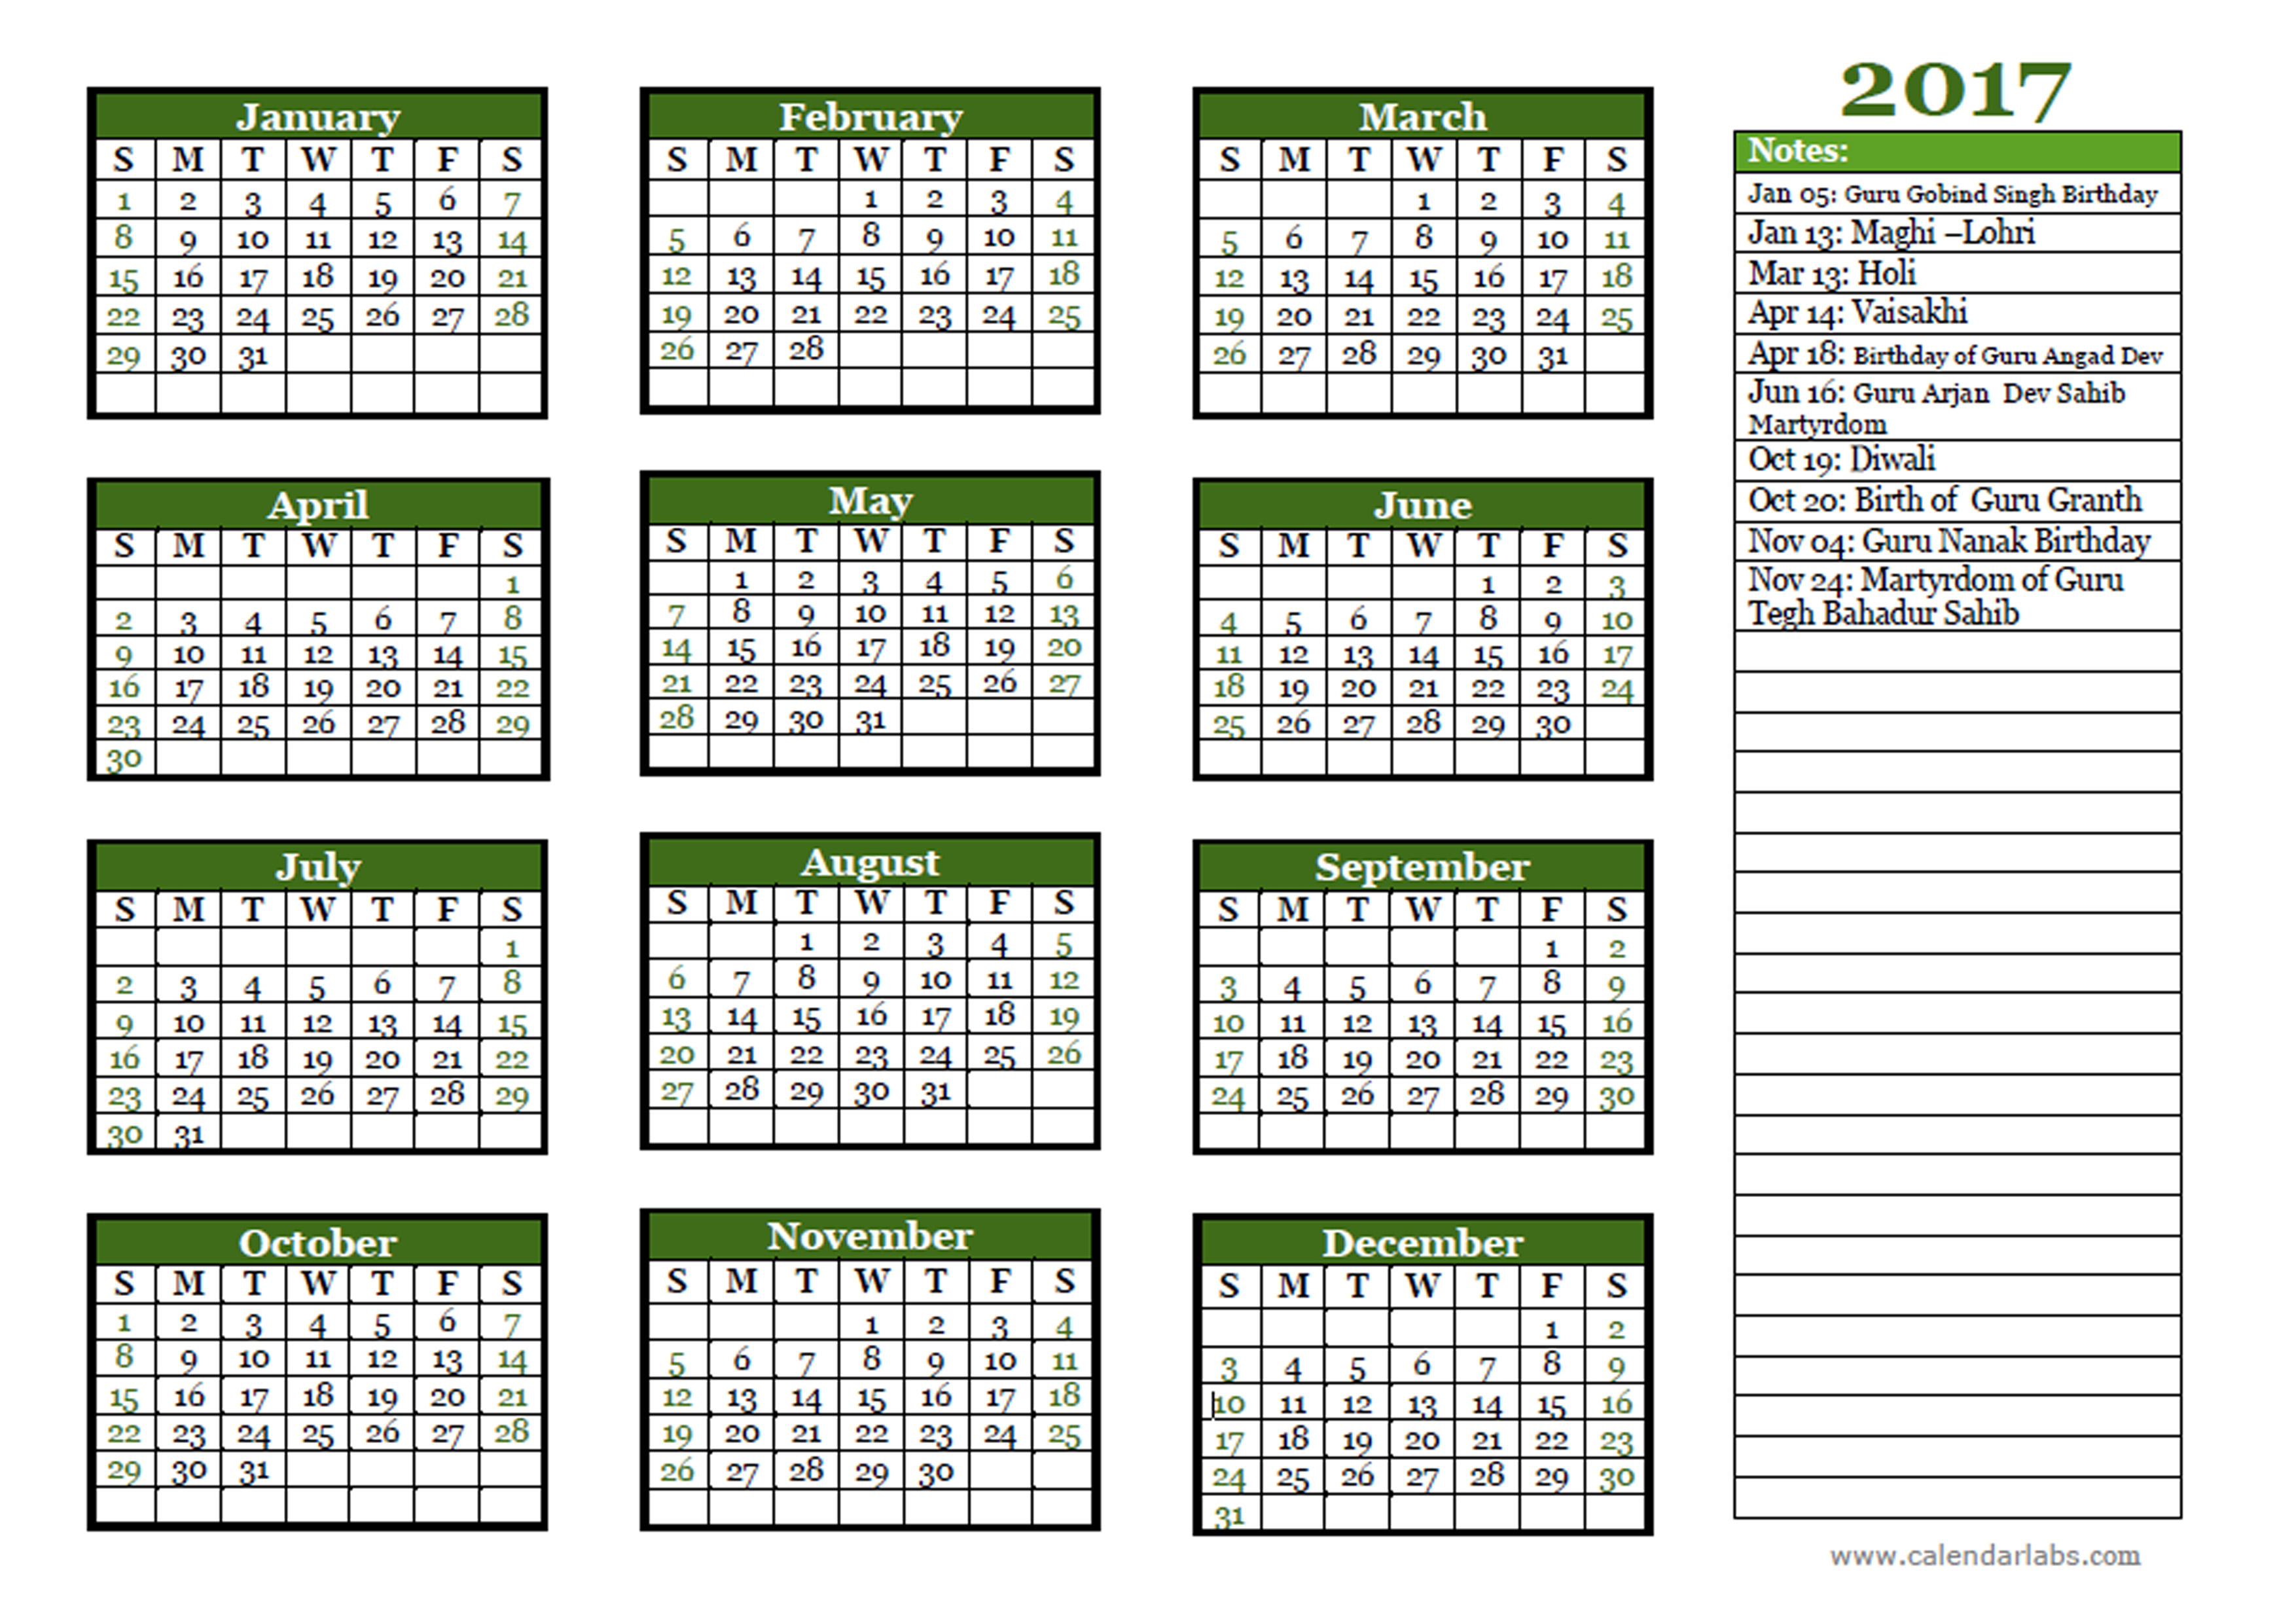 2017 Sikh Festivals Calendar Template Free Printable